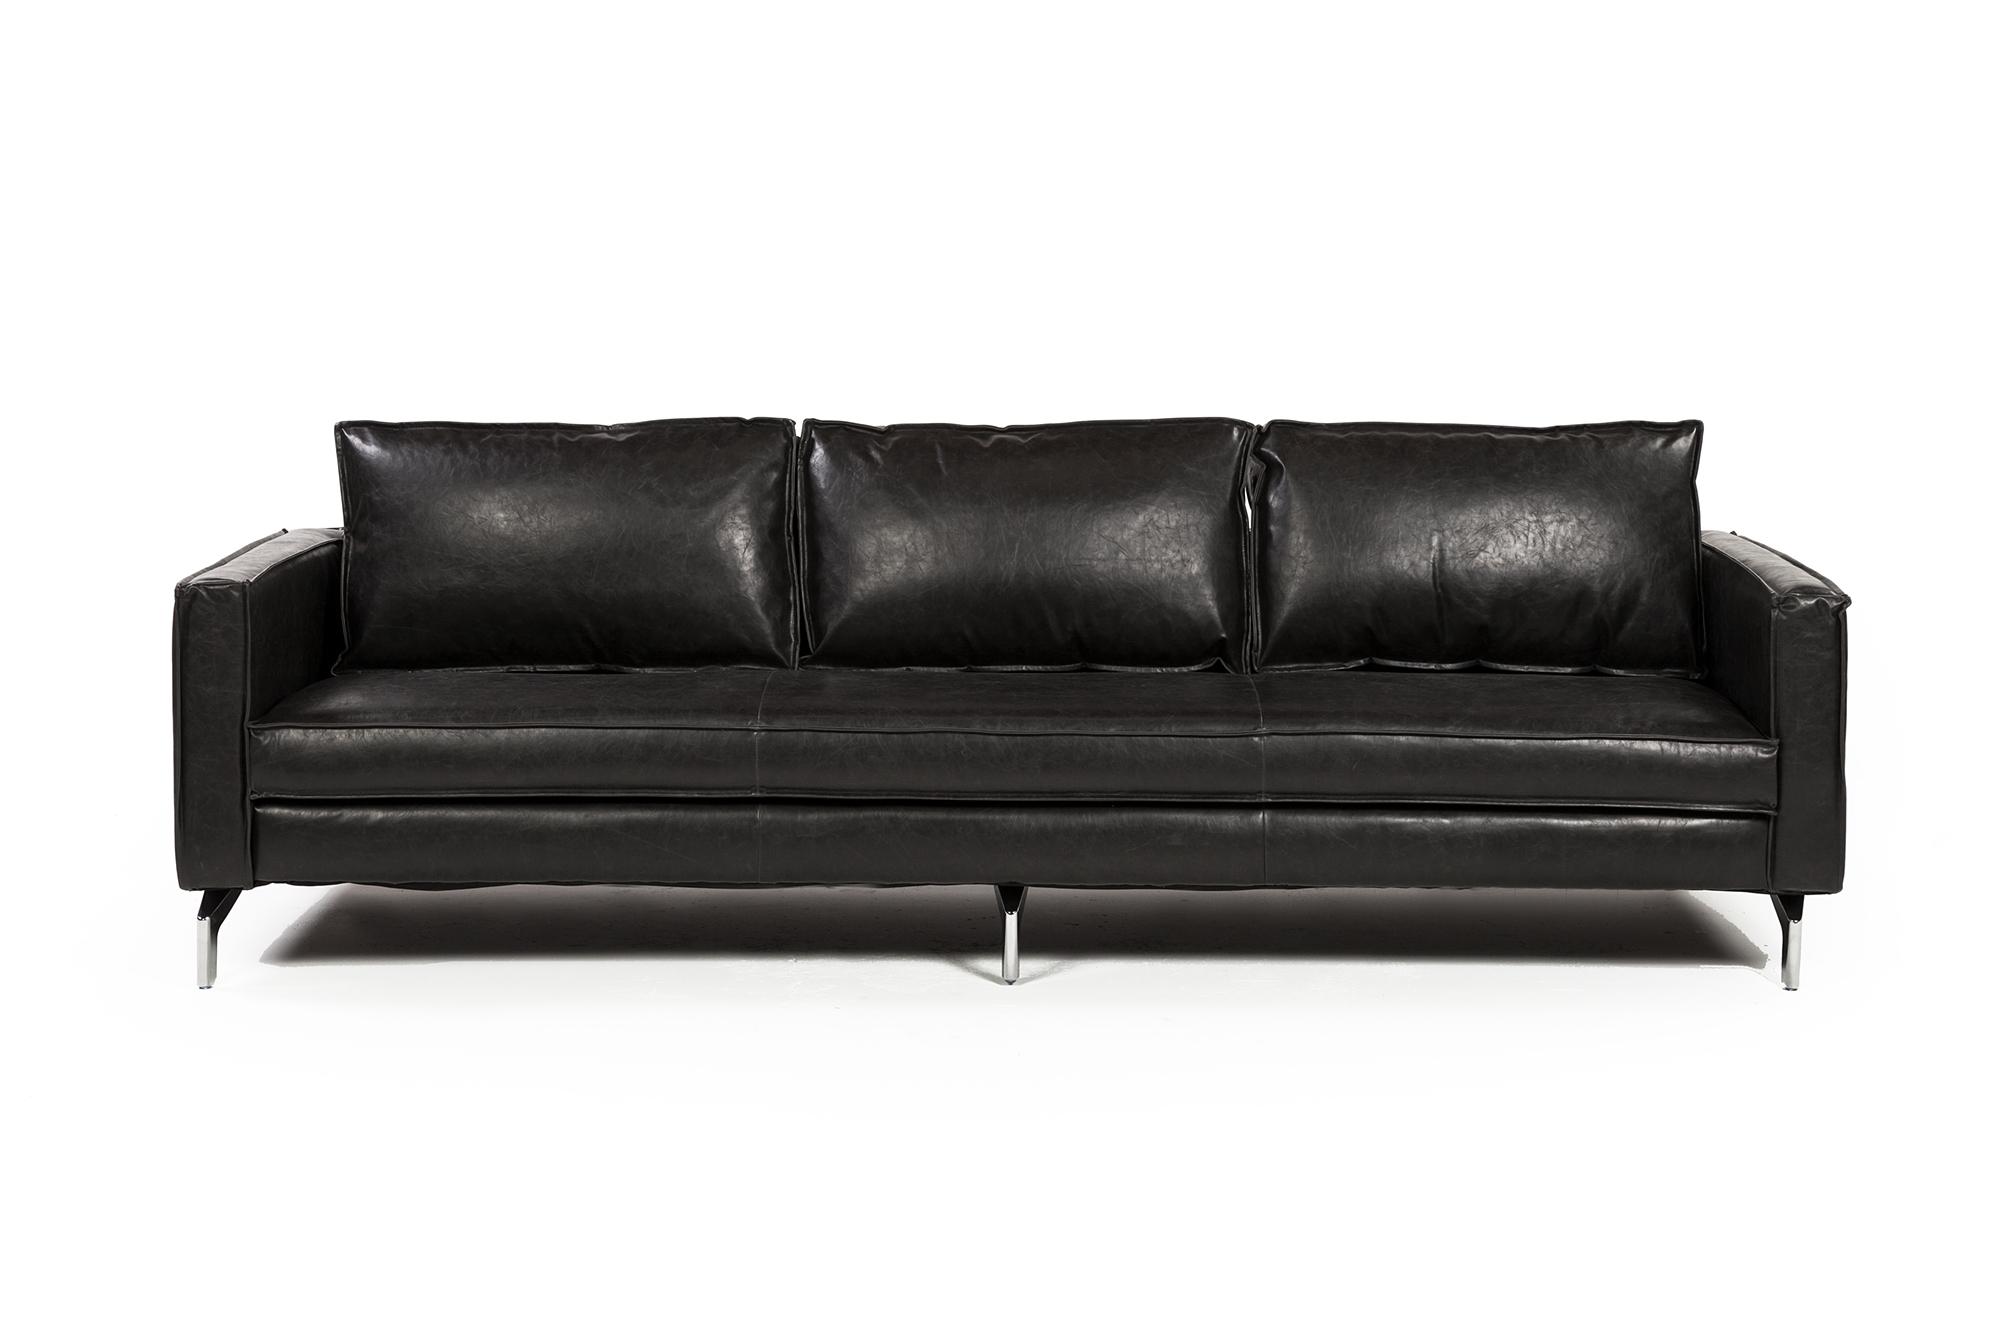 Madison 99 Quot Three Seater Sofa Distressed Black The